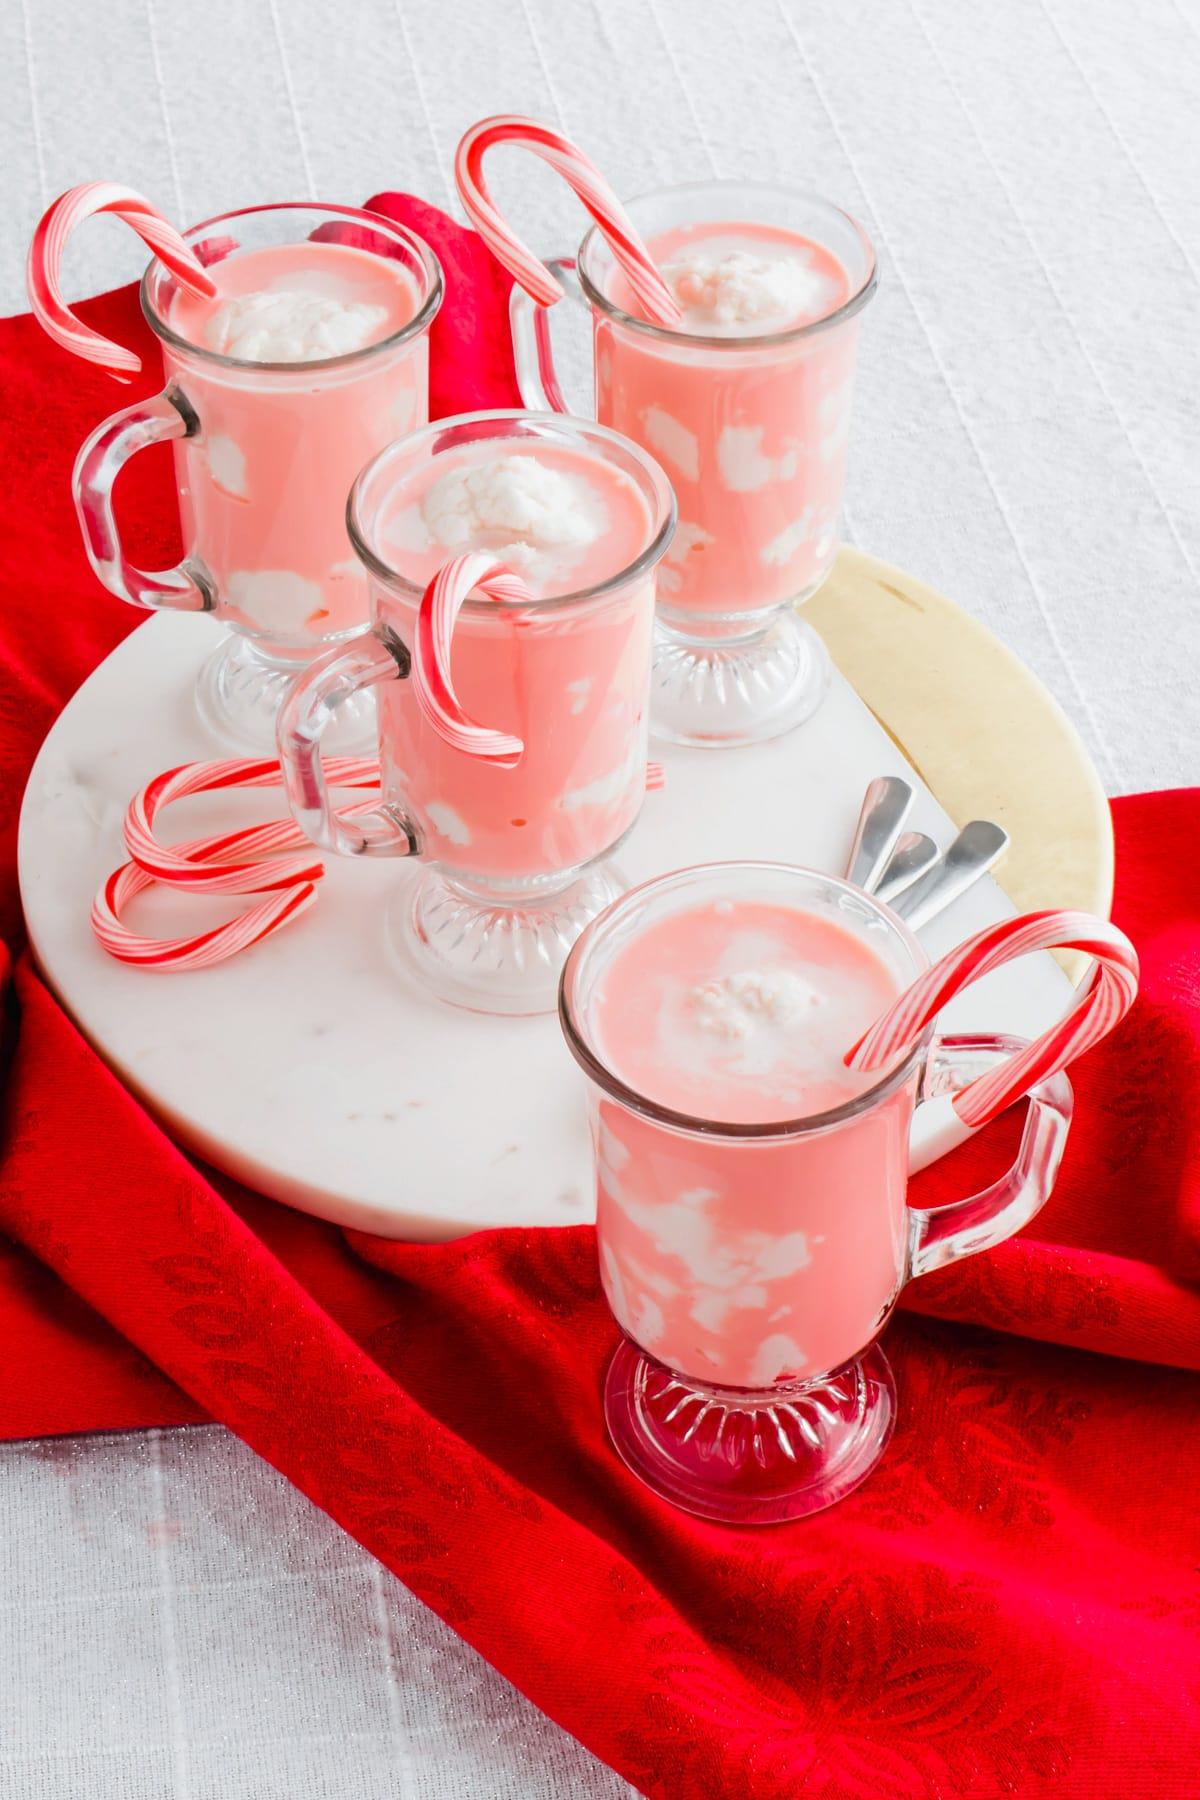 festive Candy Cane Affogato recipe by top Houston lifesyle blogger Ashley Rose of Sugar and Cloth #recipes #christmas #holiday #entertaining #idea